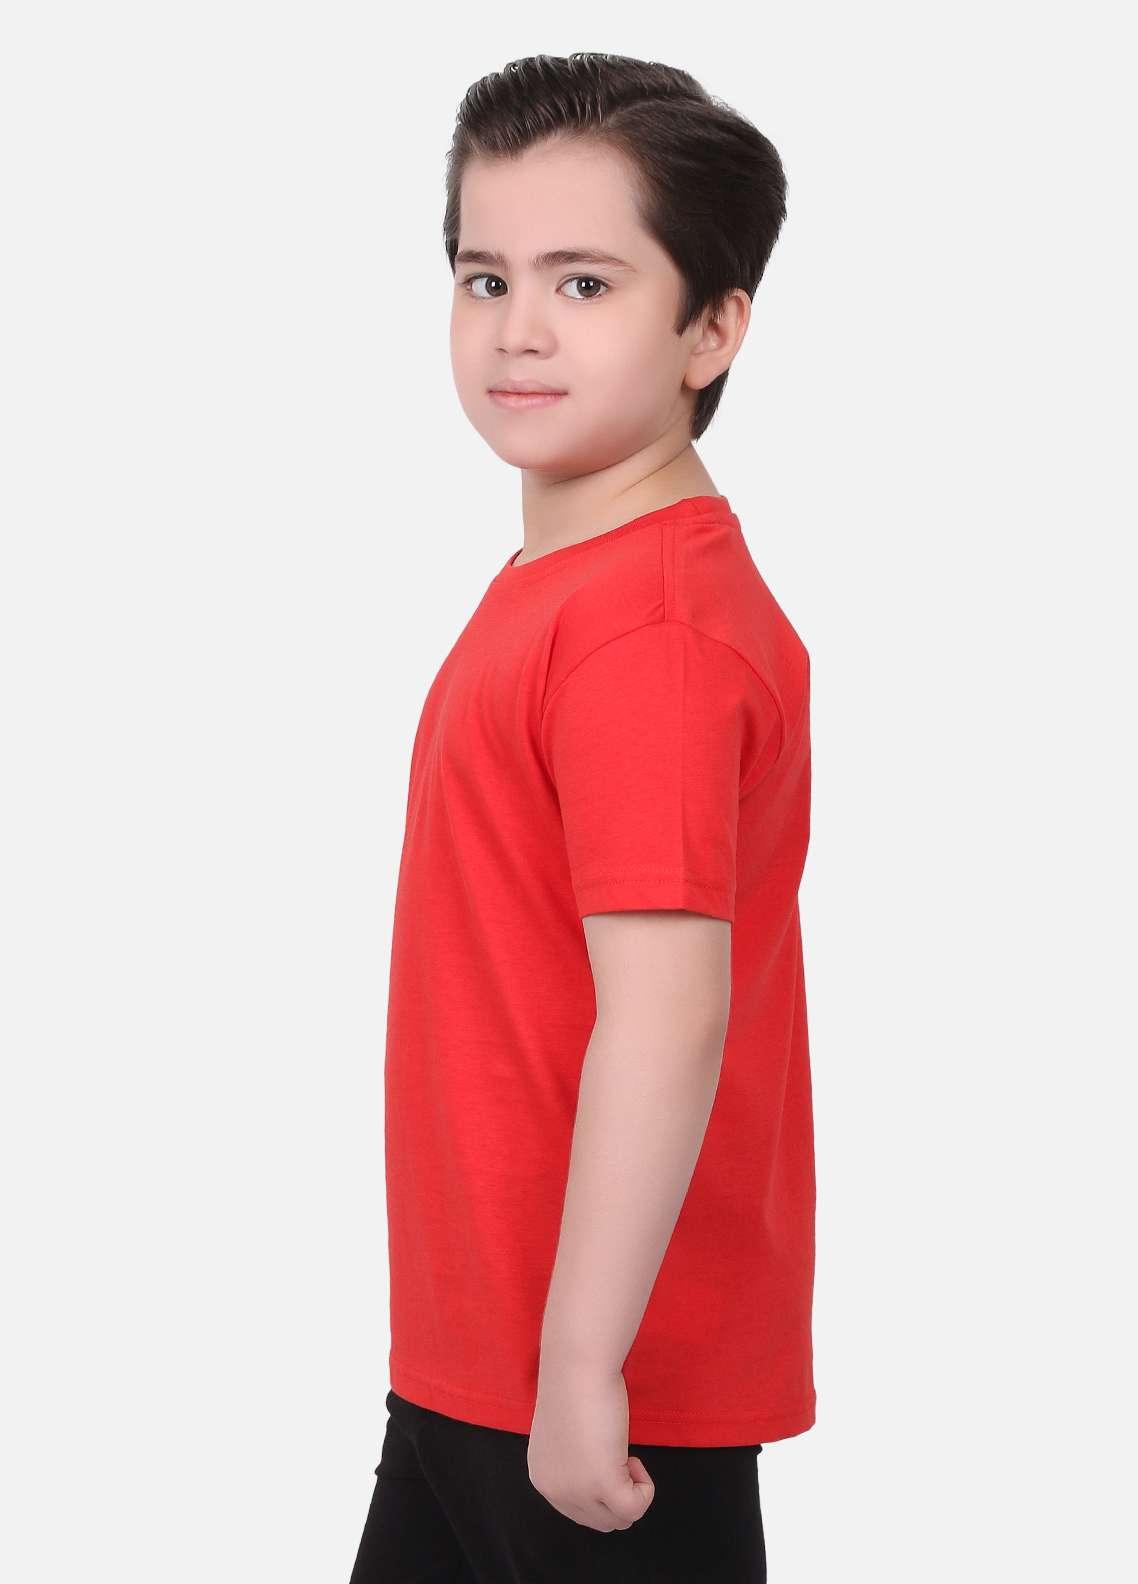 317516c66 Edenrobe Cotton Casual Boys T-Shirts - Red EDK18TS 007